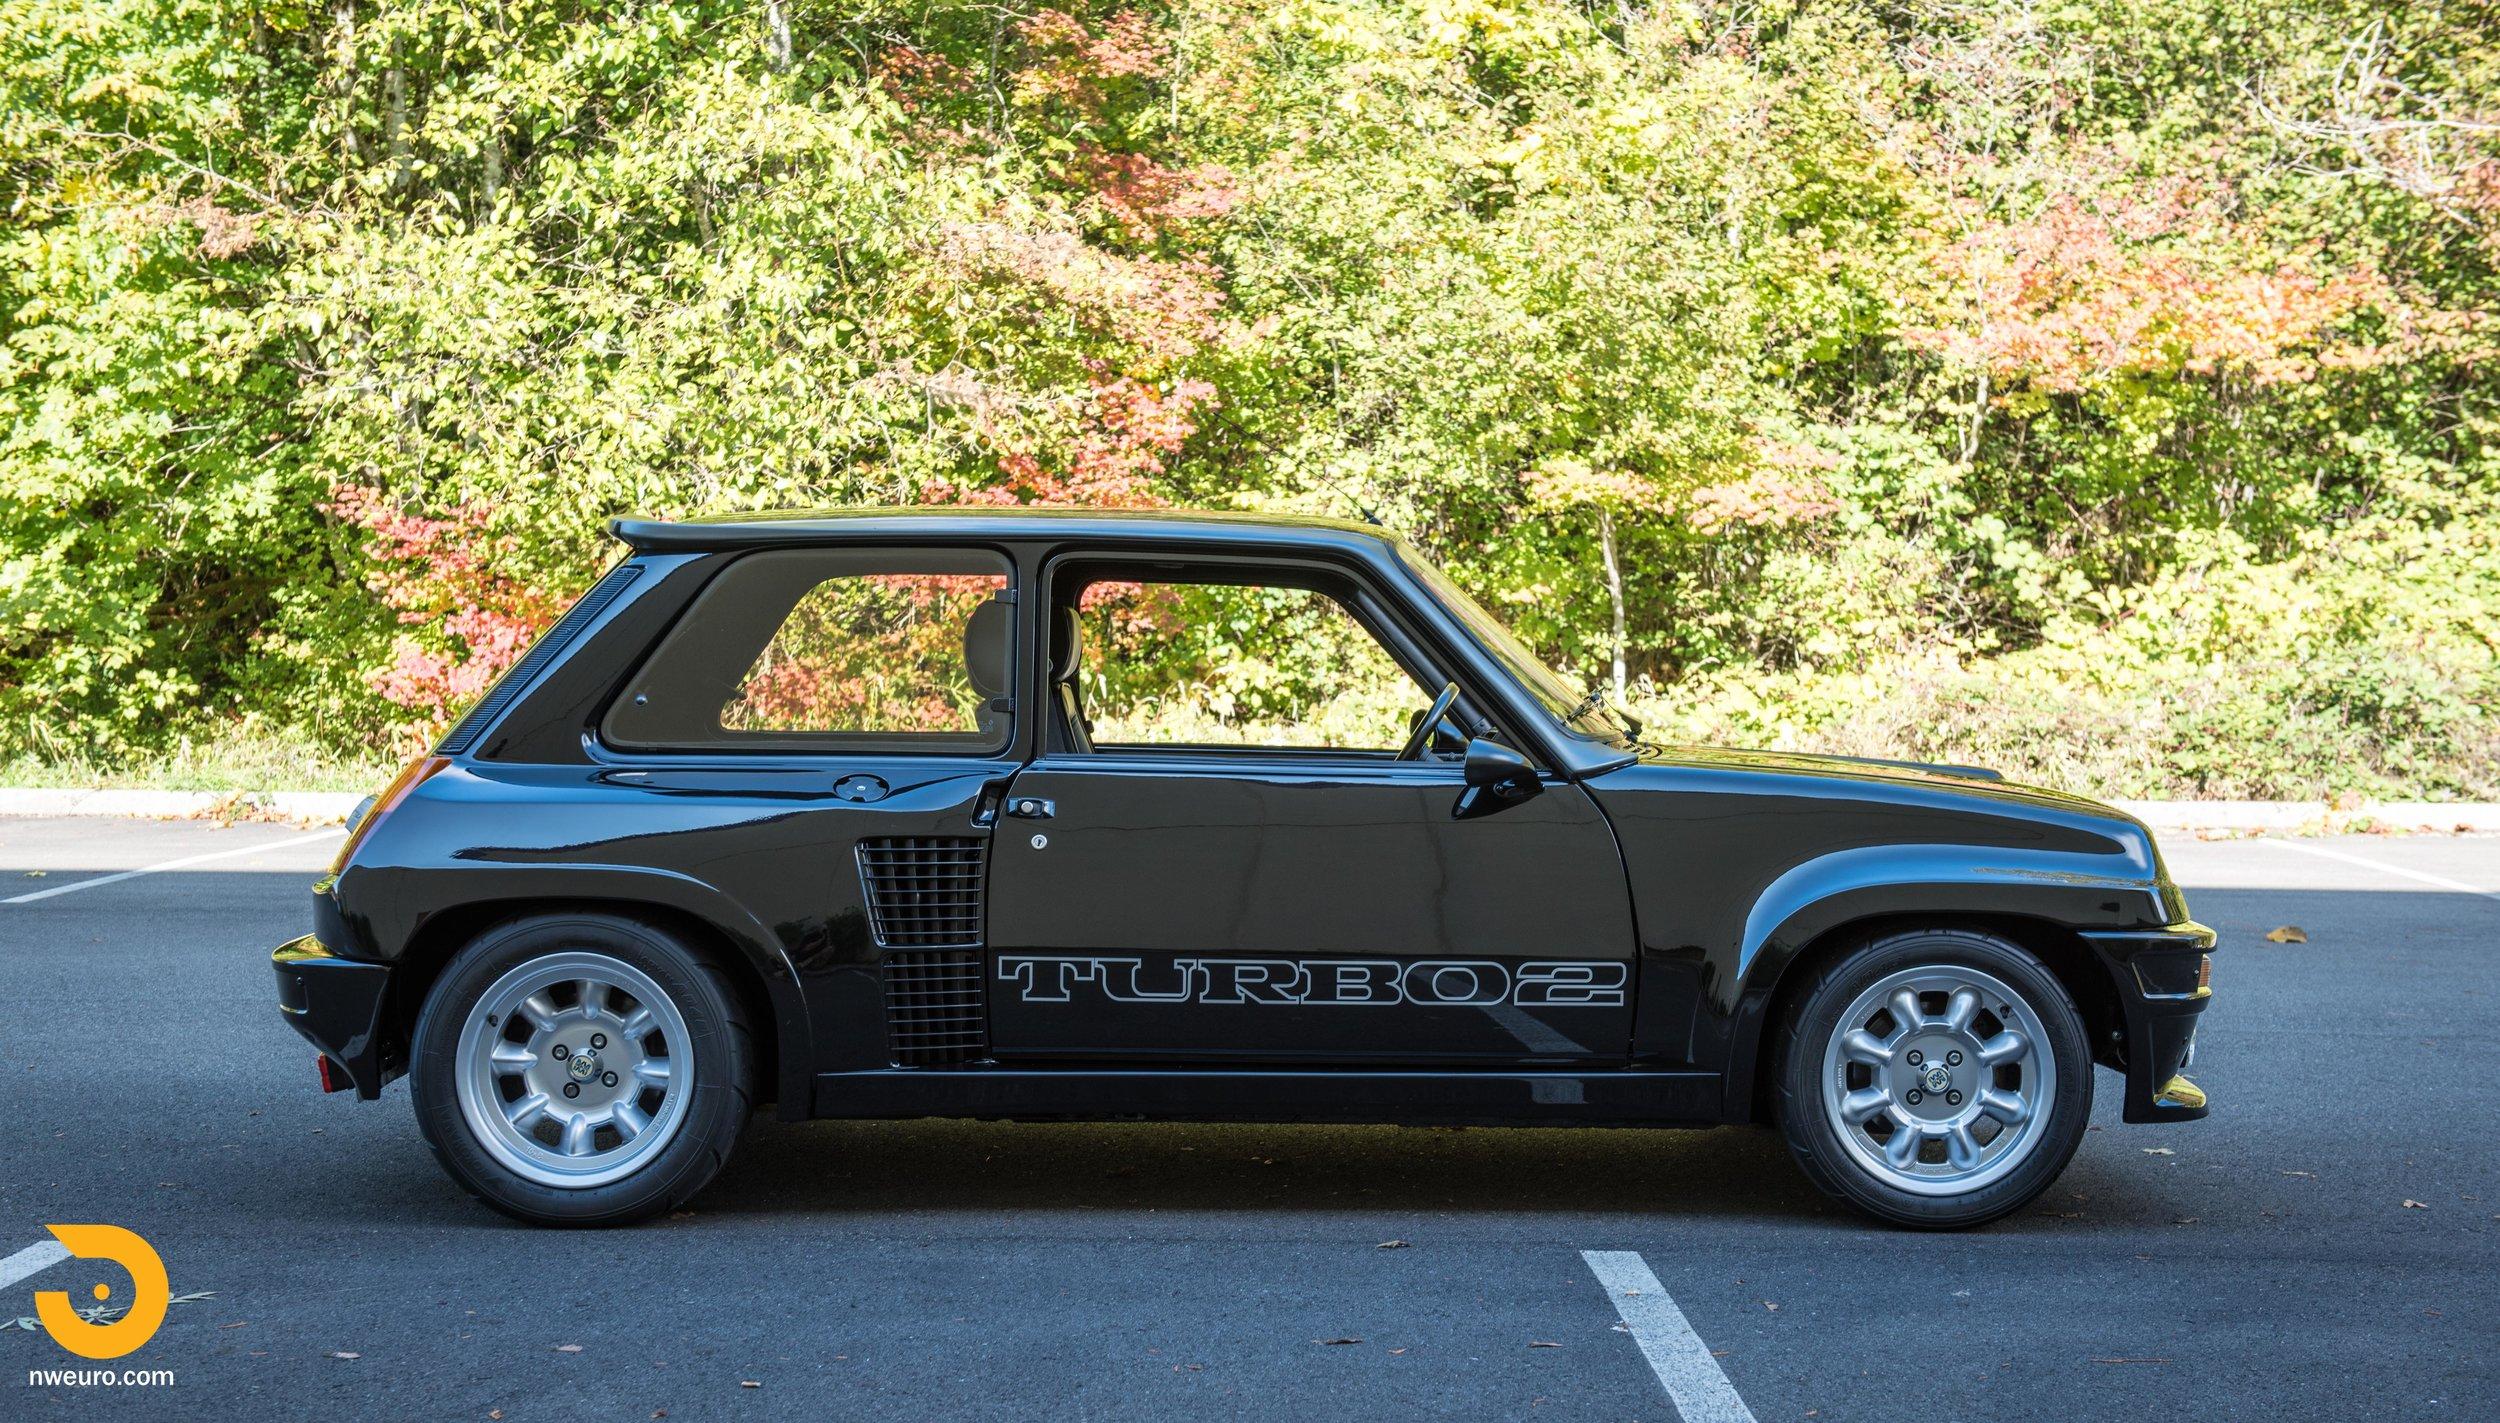 1983 Renault R5 Turbo 2 Black-33.jpg